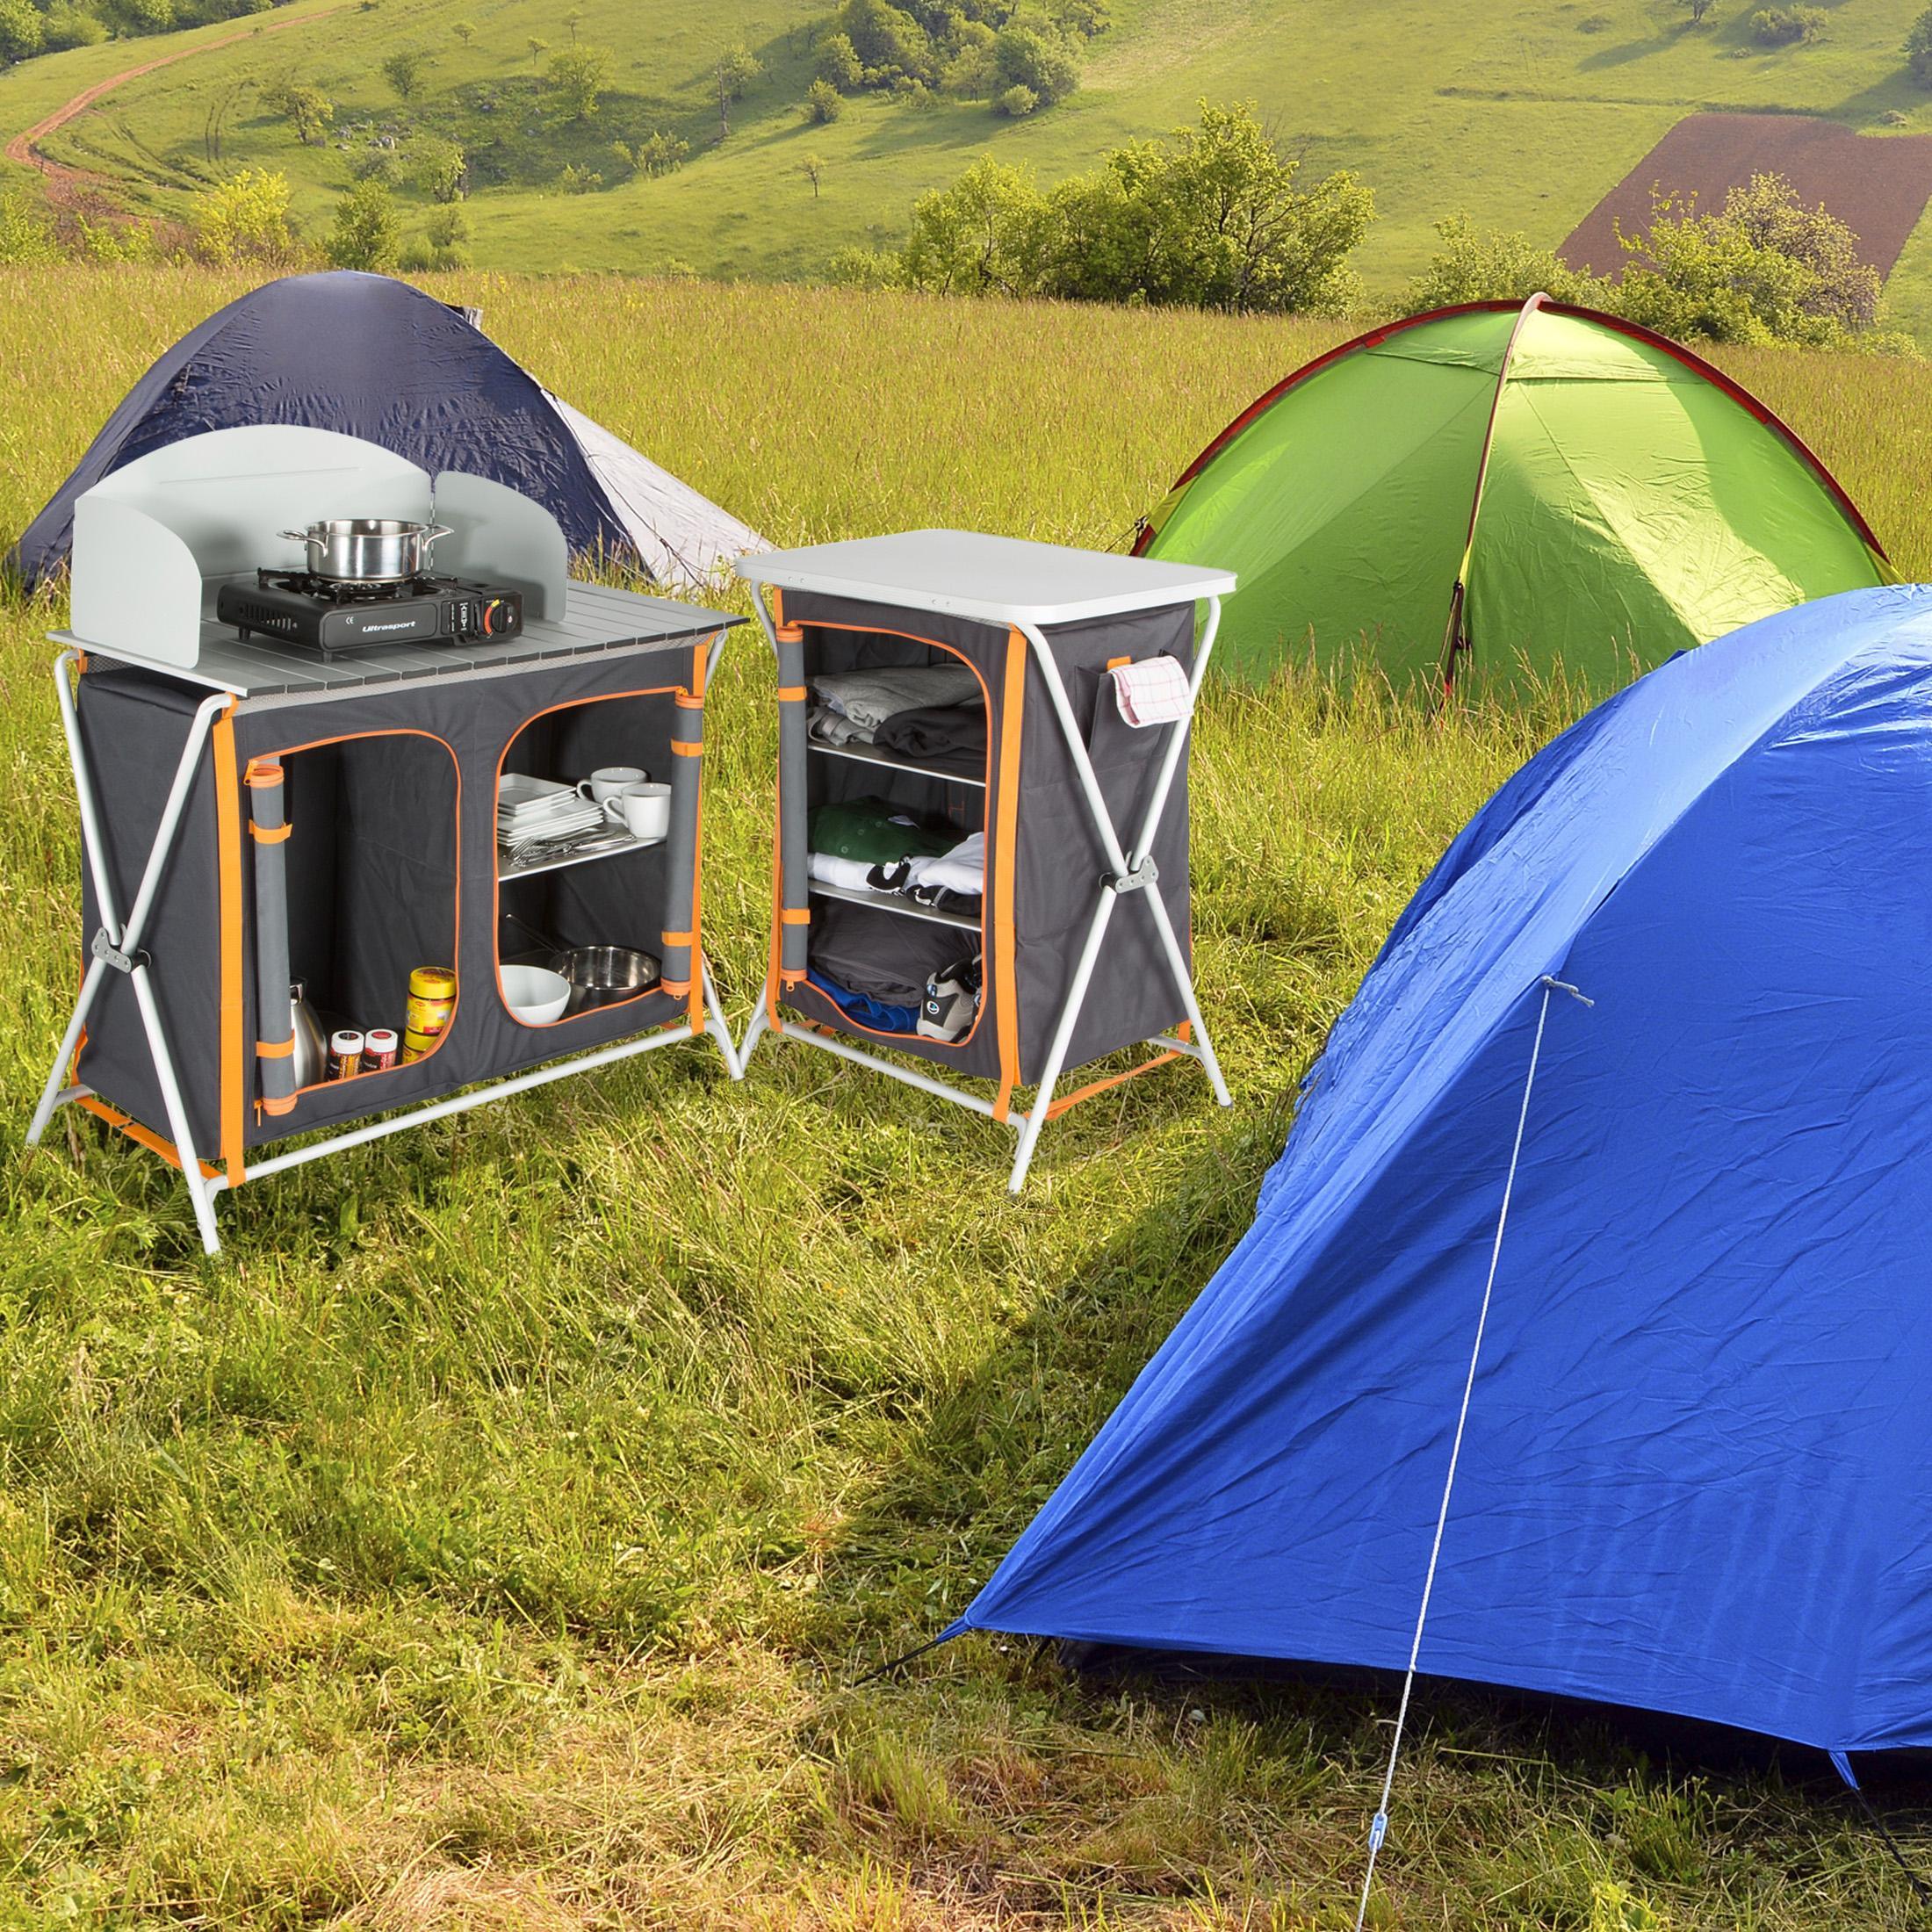 ultrasport campingk che faltschrank 3 f cher arbeitsfl che inkl windschutz. Black Bedroom Furniture Sets. Home Design Ideas